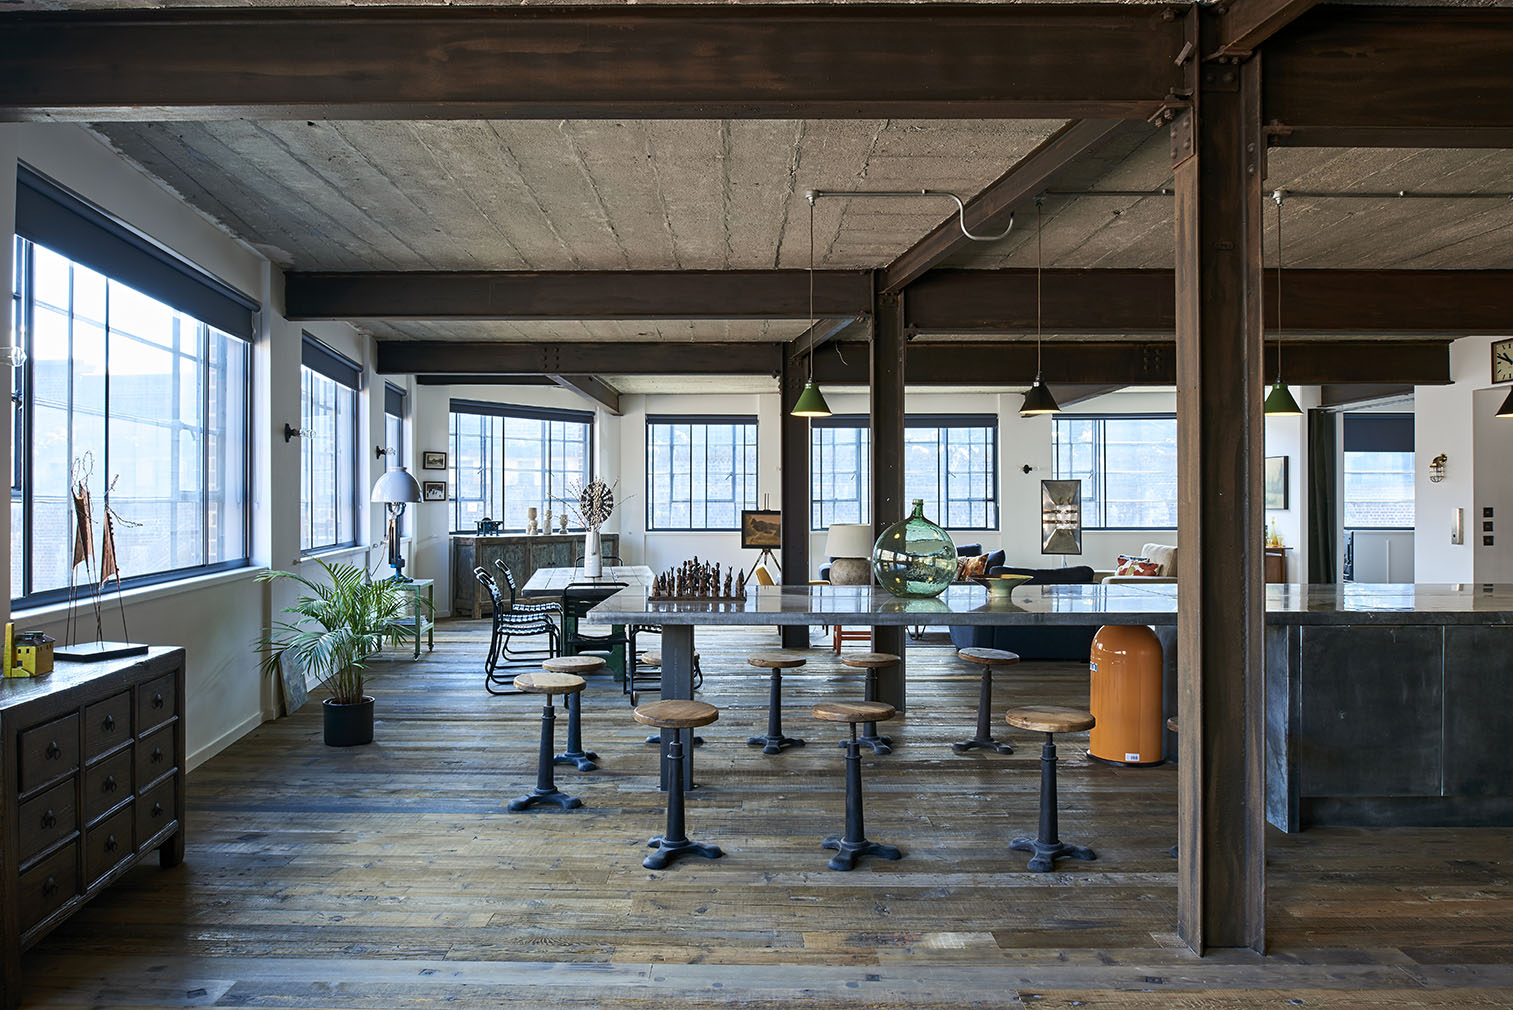 Birmingham loft for sale